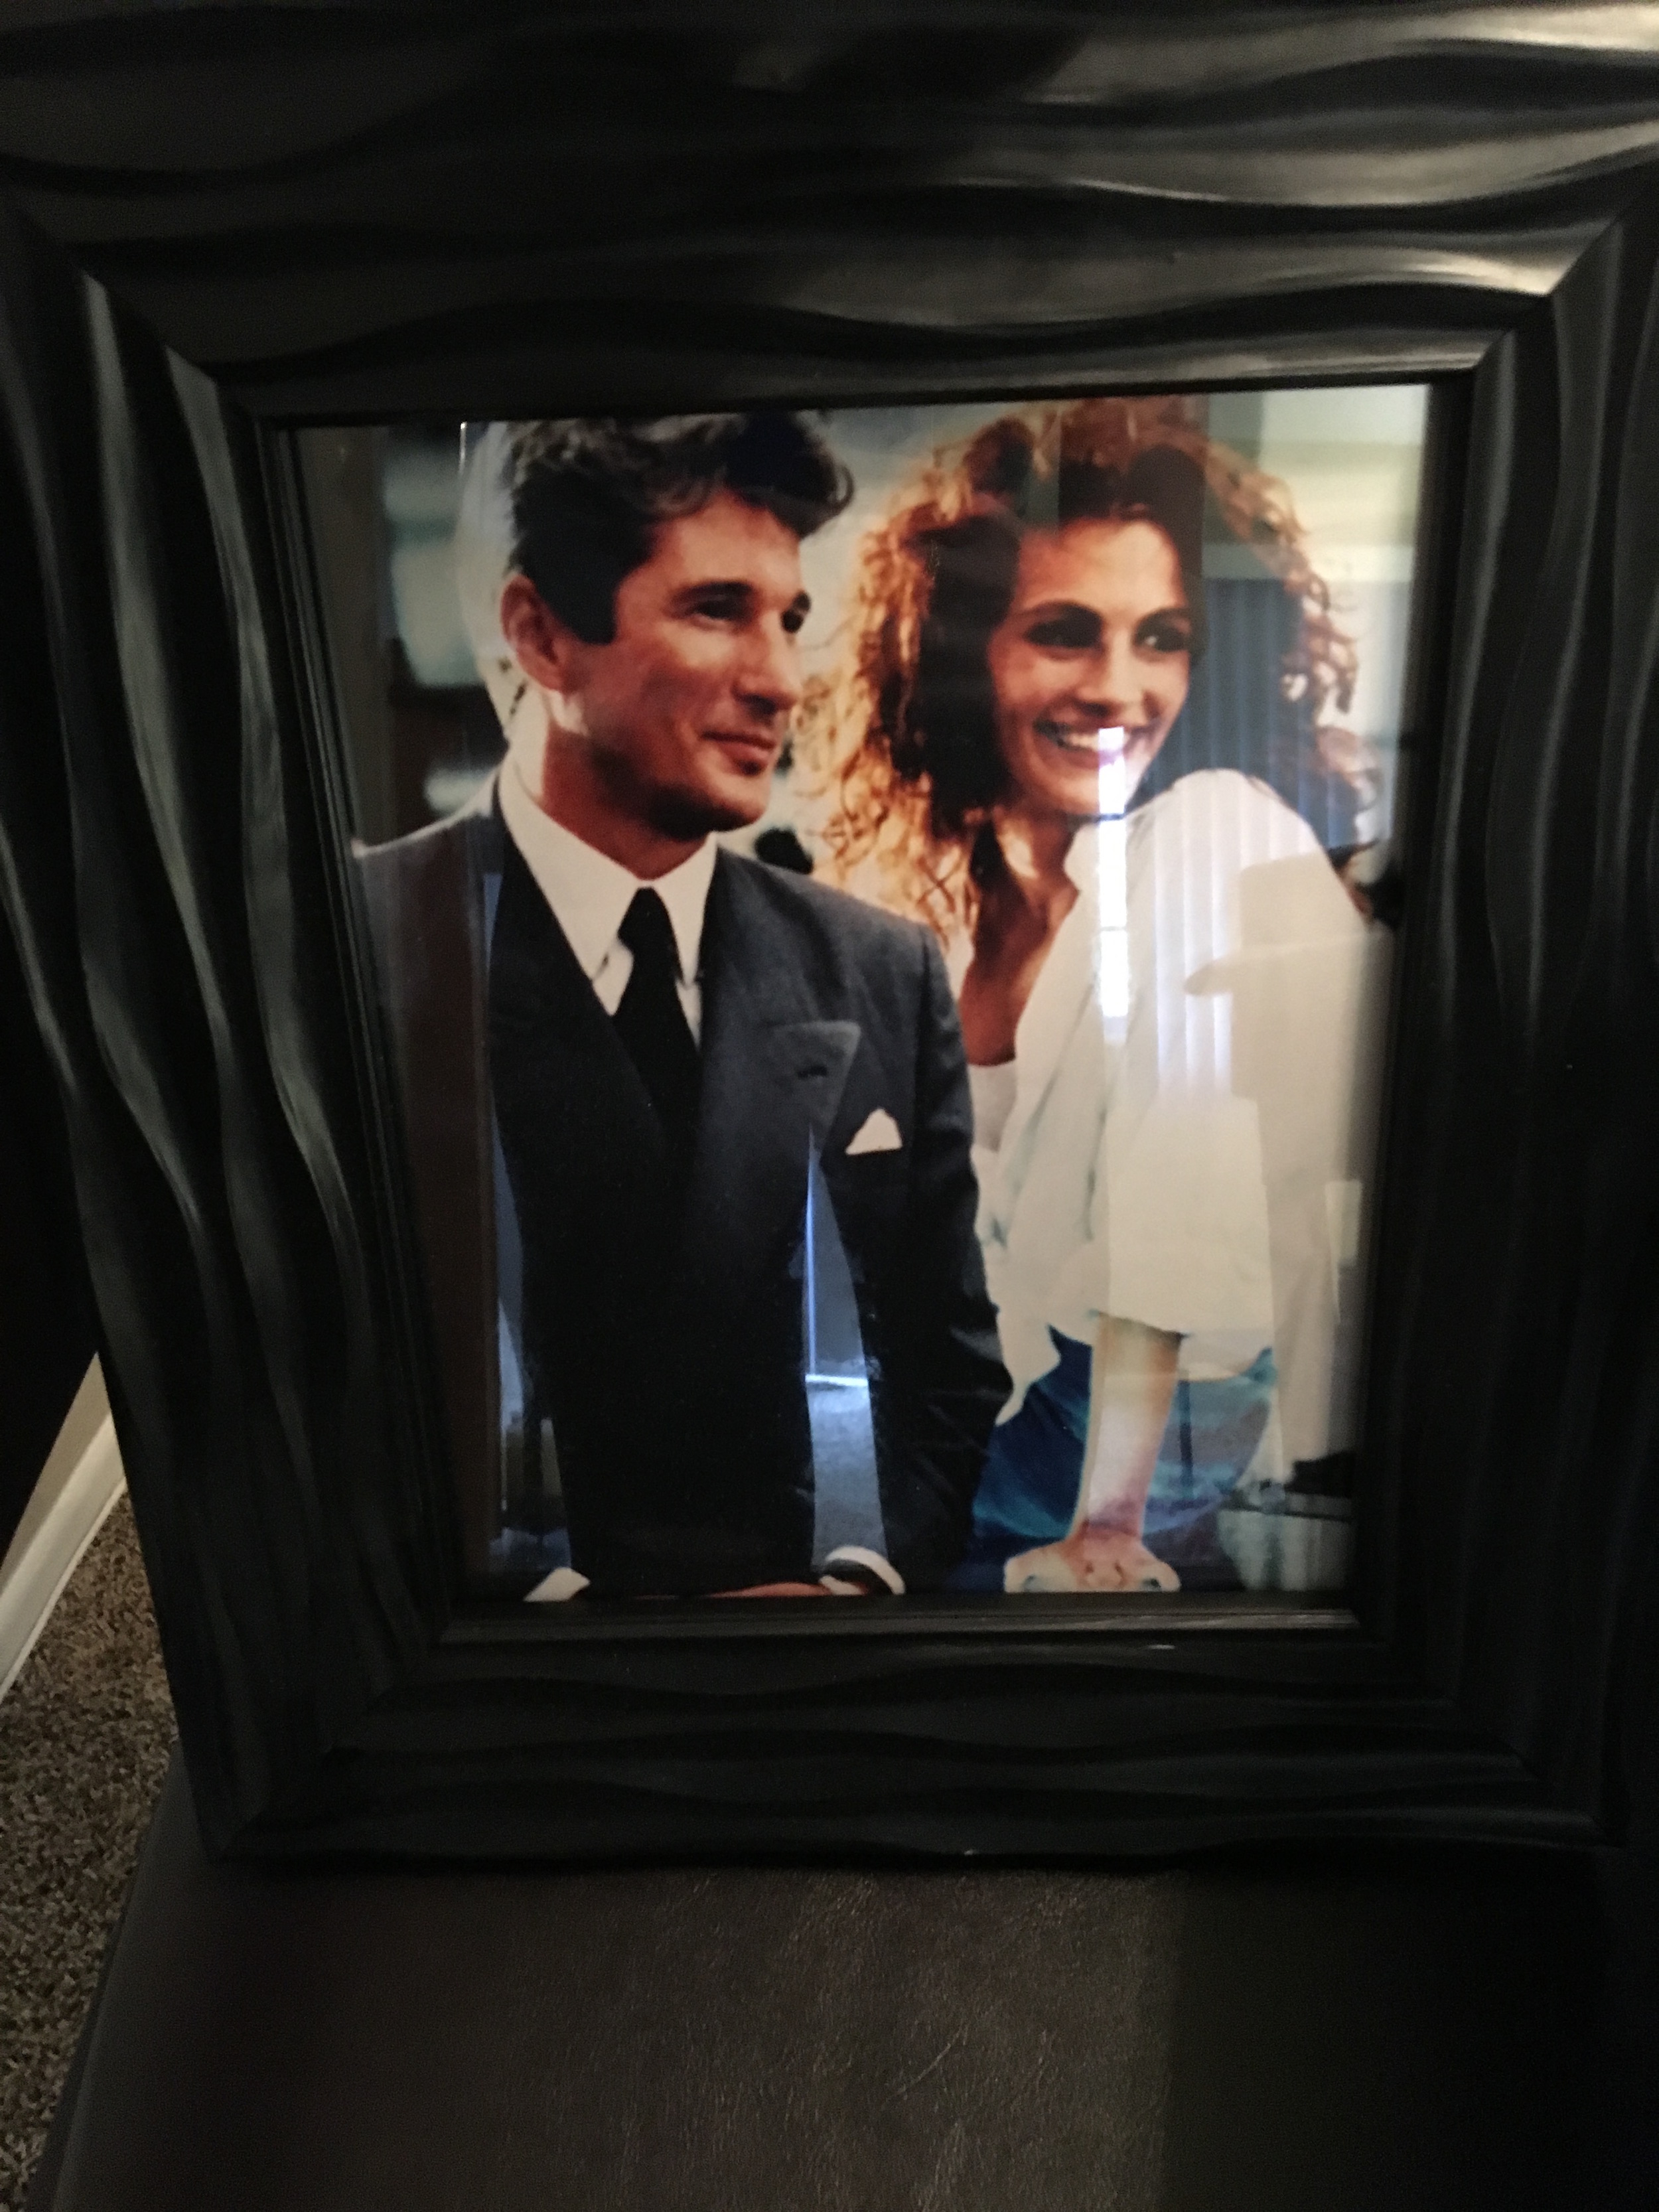 Corinne's bedside photo